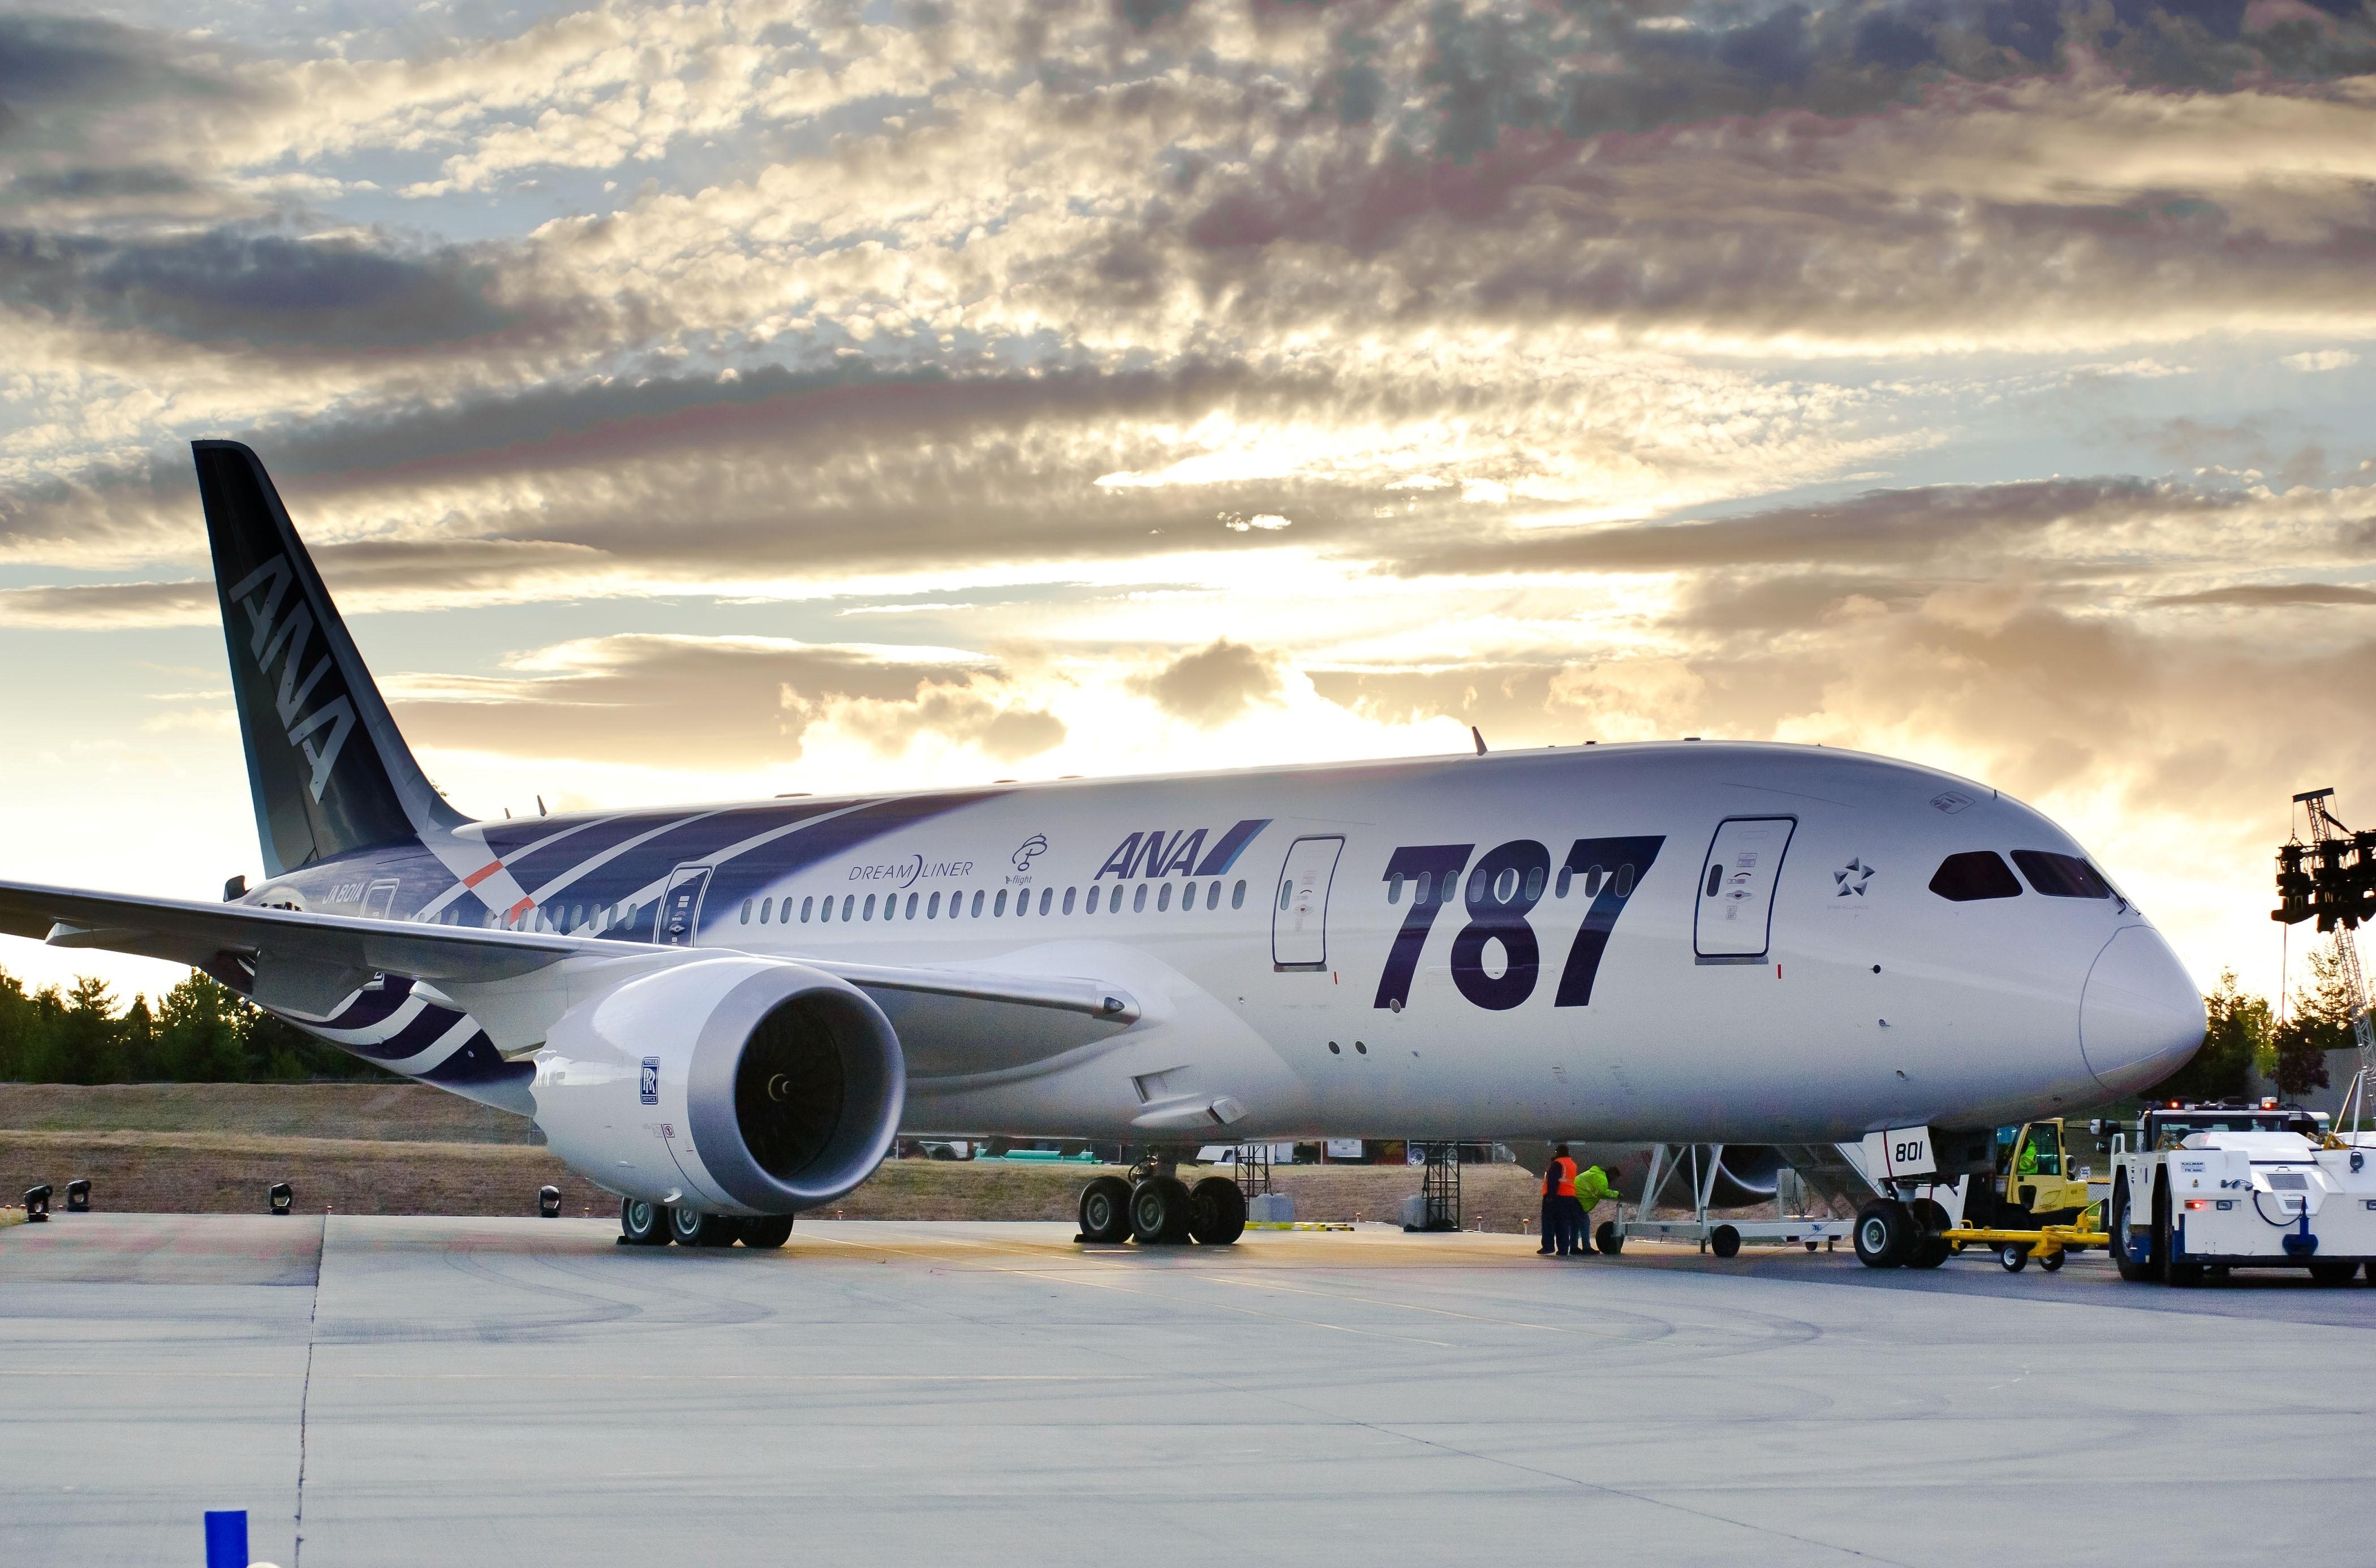 Comapania All Nippon Airways a înregistrat un record de 100.000 de zboruri comerciale cu Boeing 787 Dreamliner